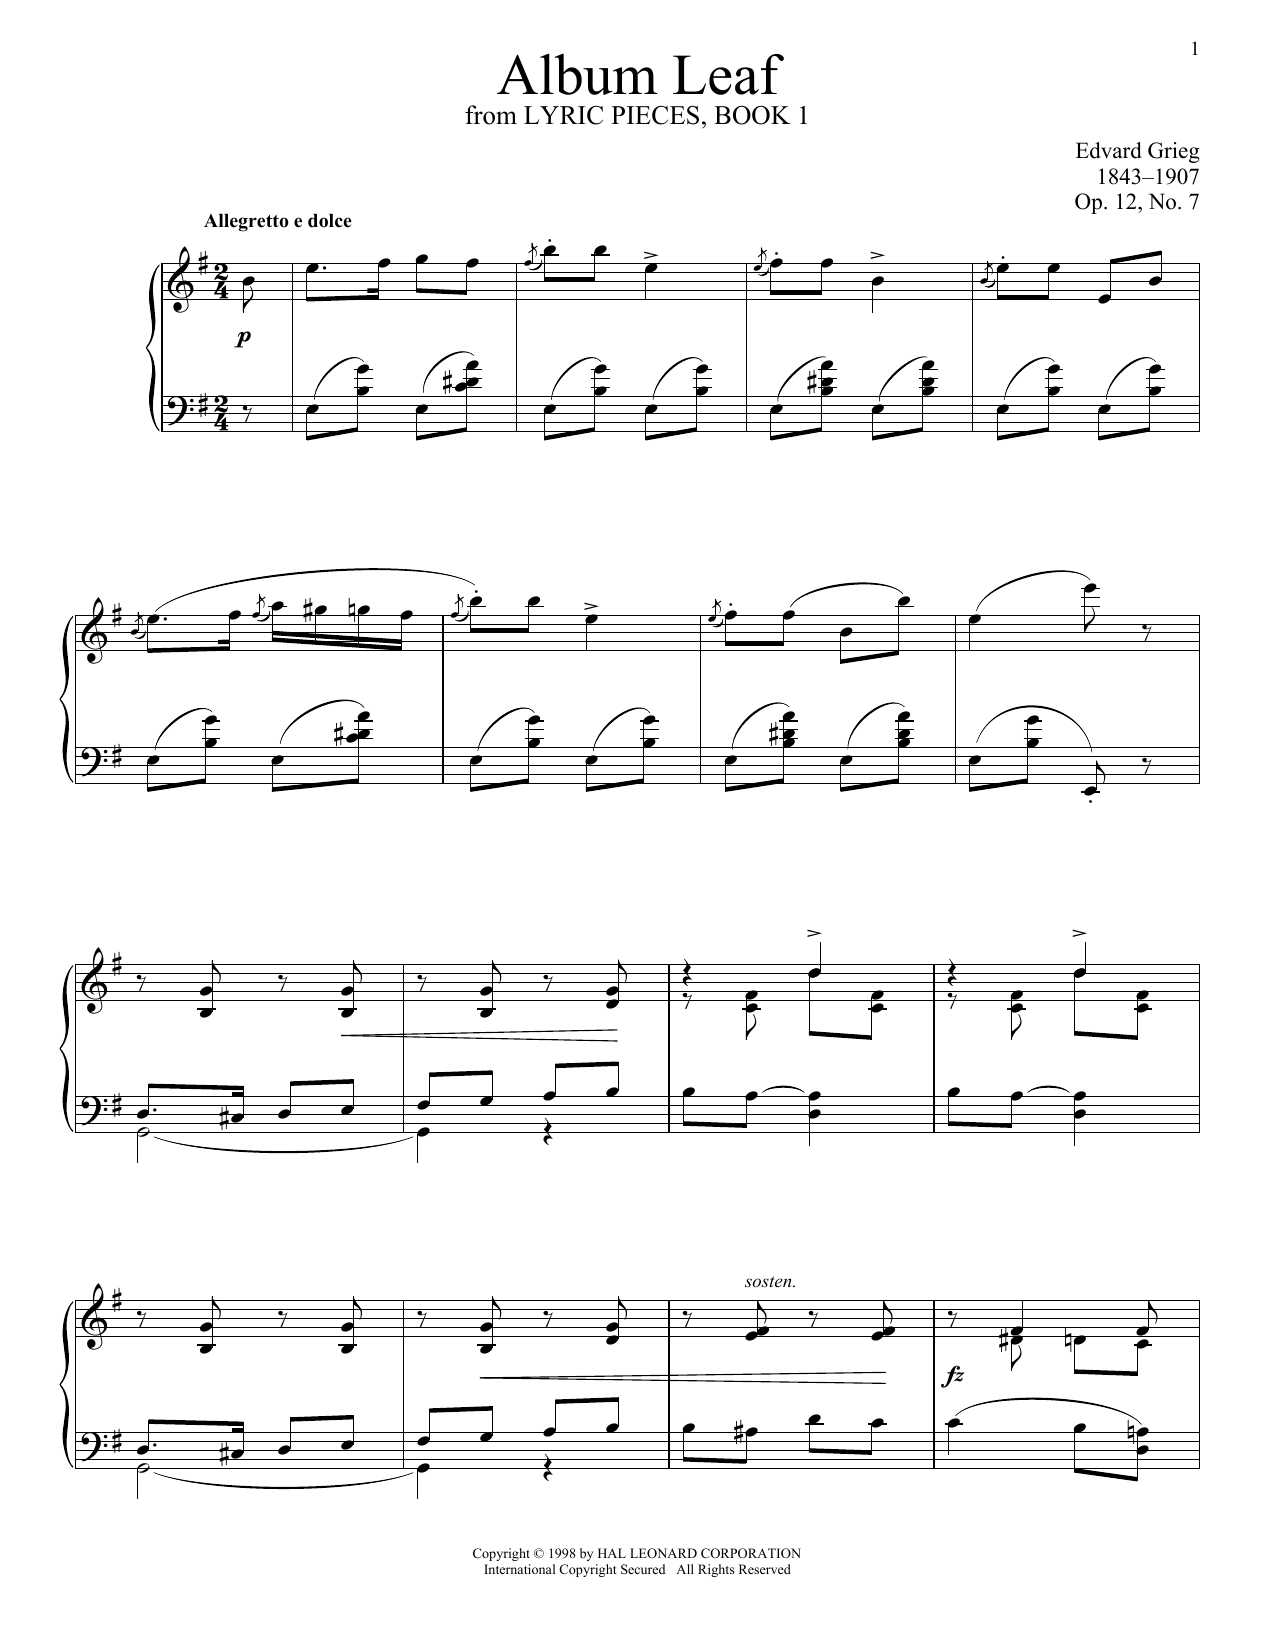 Edvard Grieg Album Leaf, Op. 12, No. 7 sheet music notes and chords. Download Printable PDF.